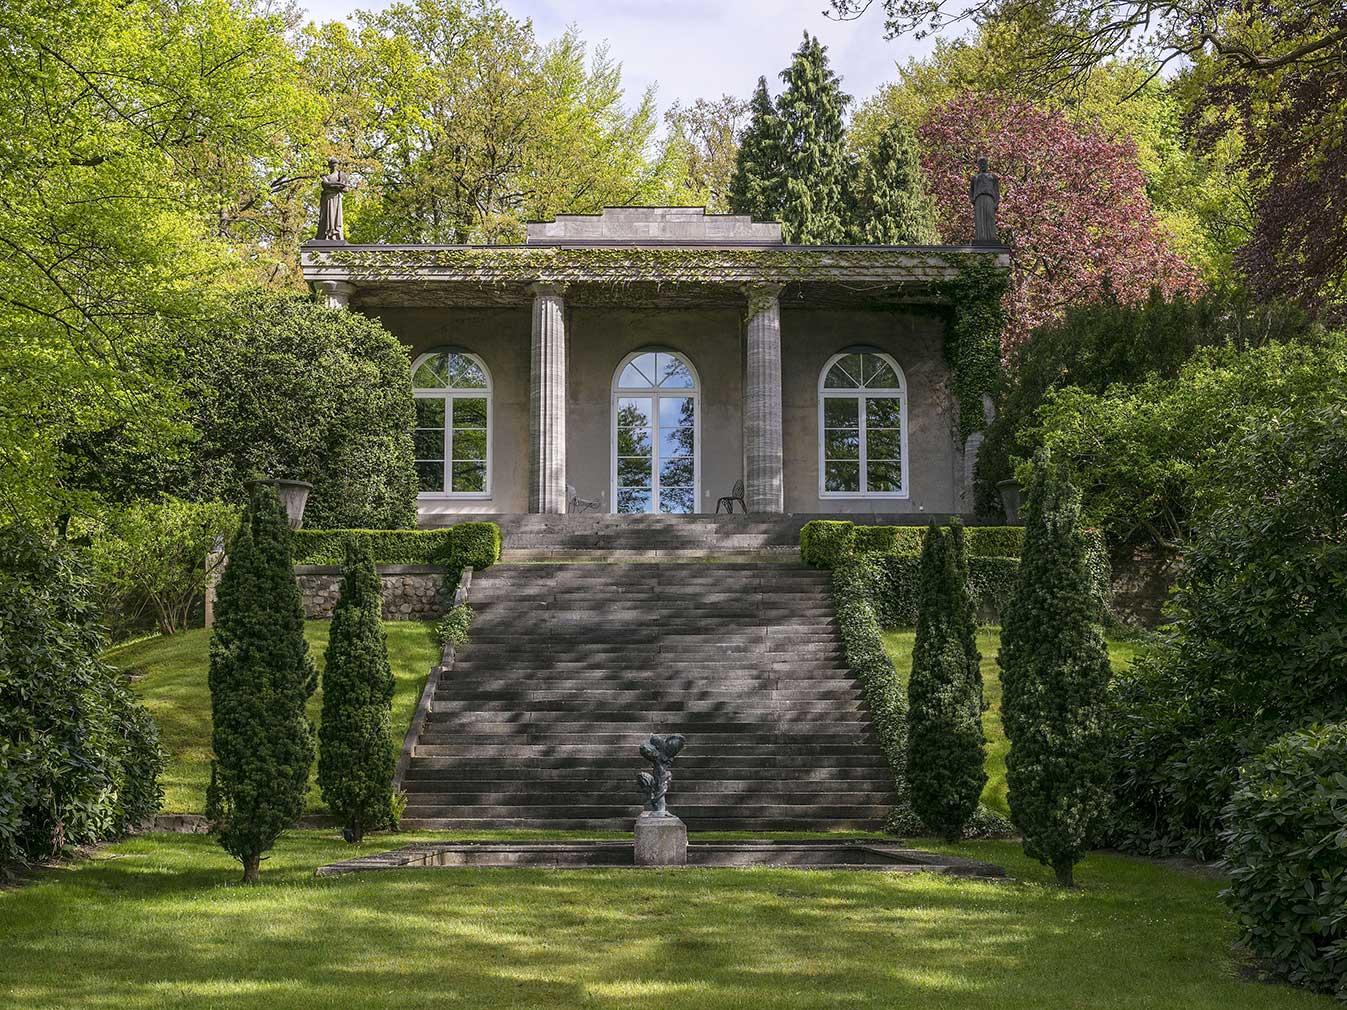 Karl Lagerfeld's former Hamburg home, Villa Jako